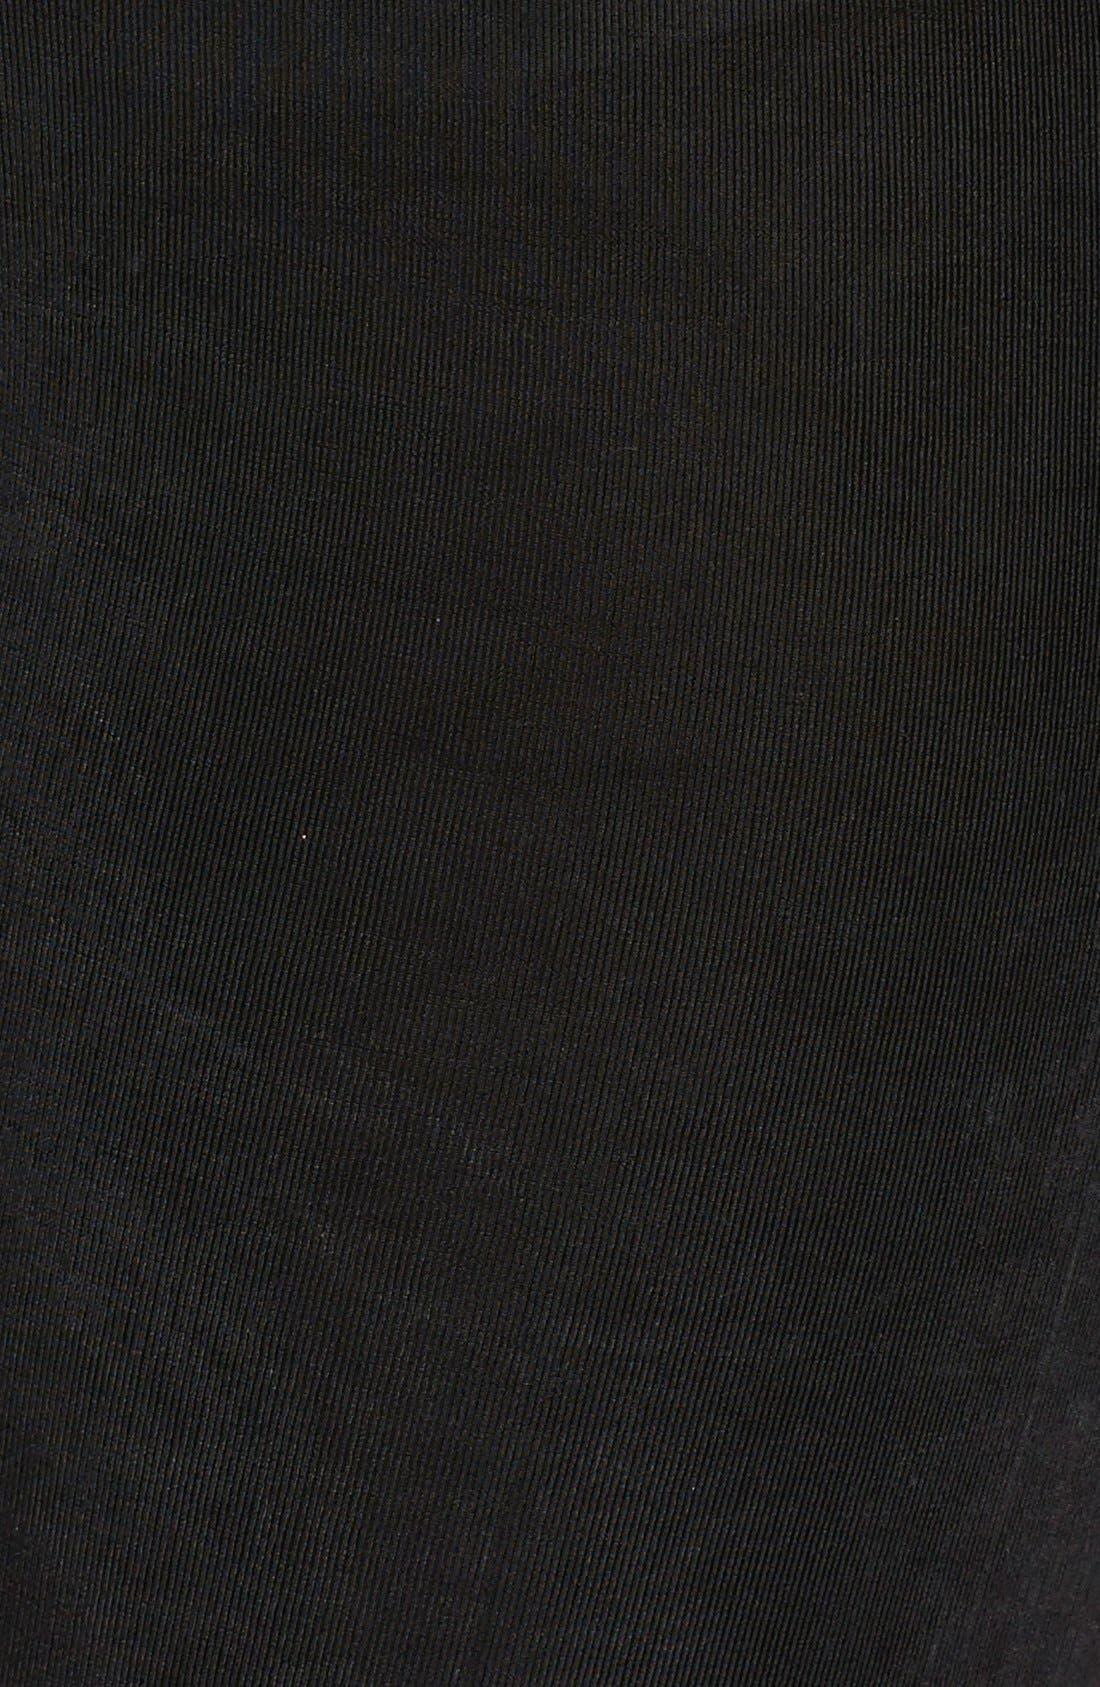 Alternate Image 3  - Vikki Vi Stretch Knit Slim Pants (Plus Size)